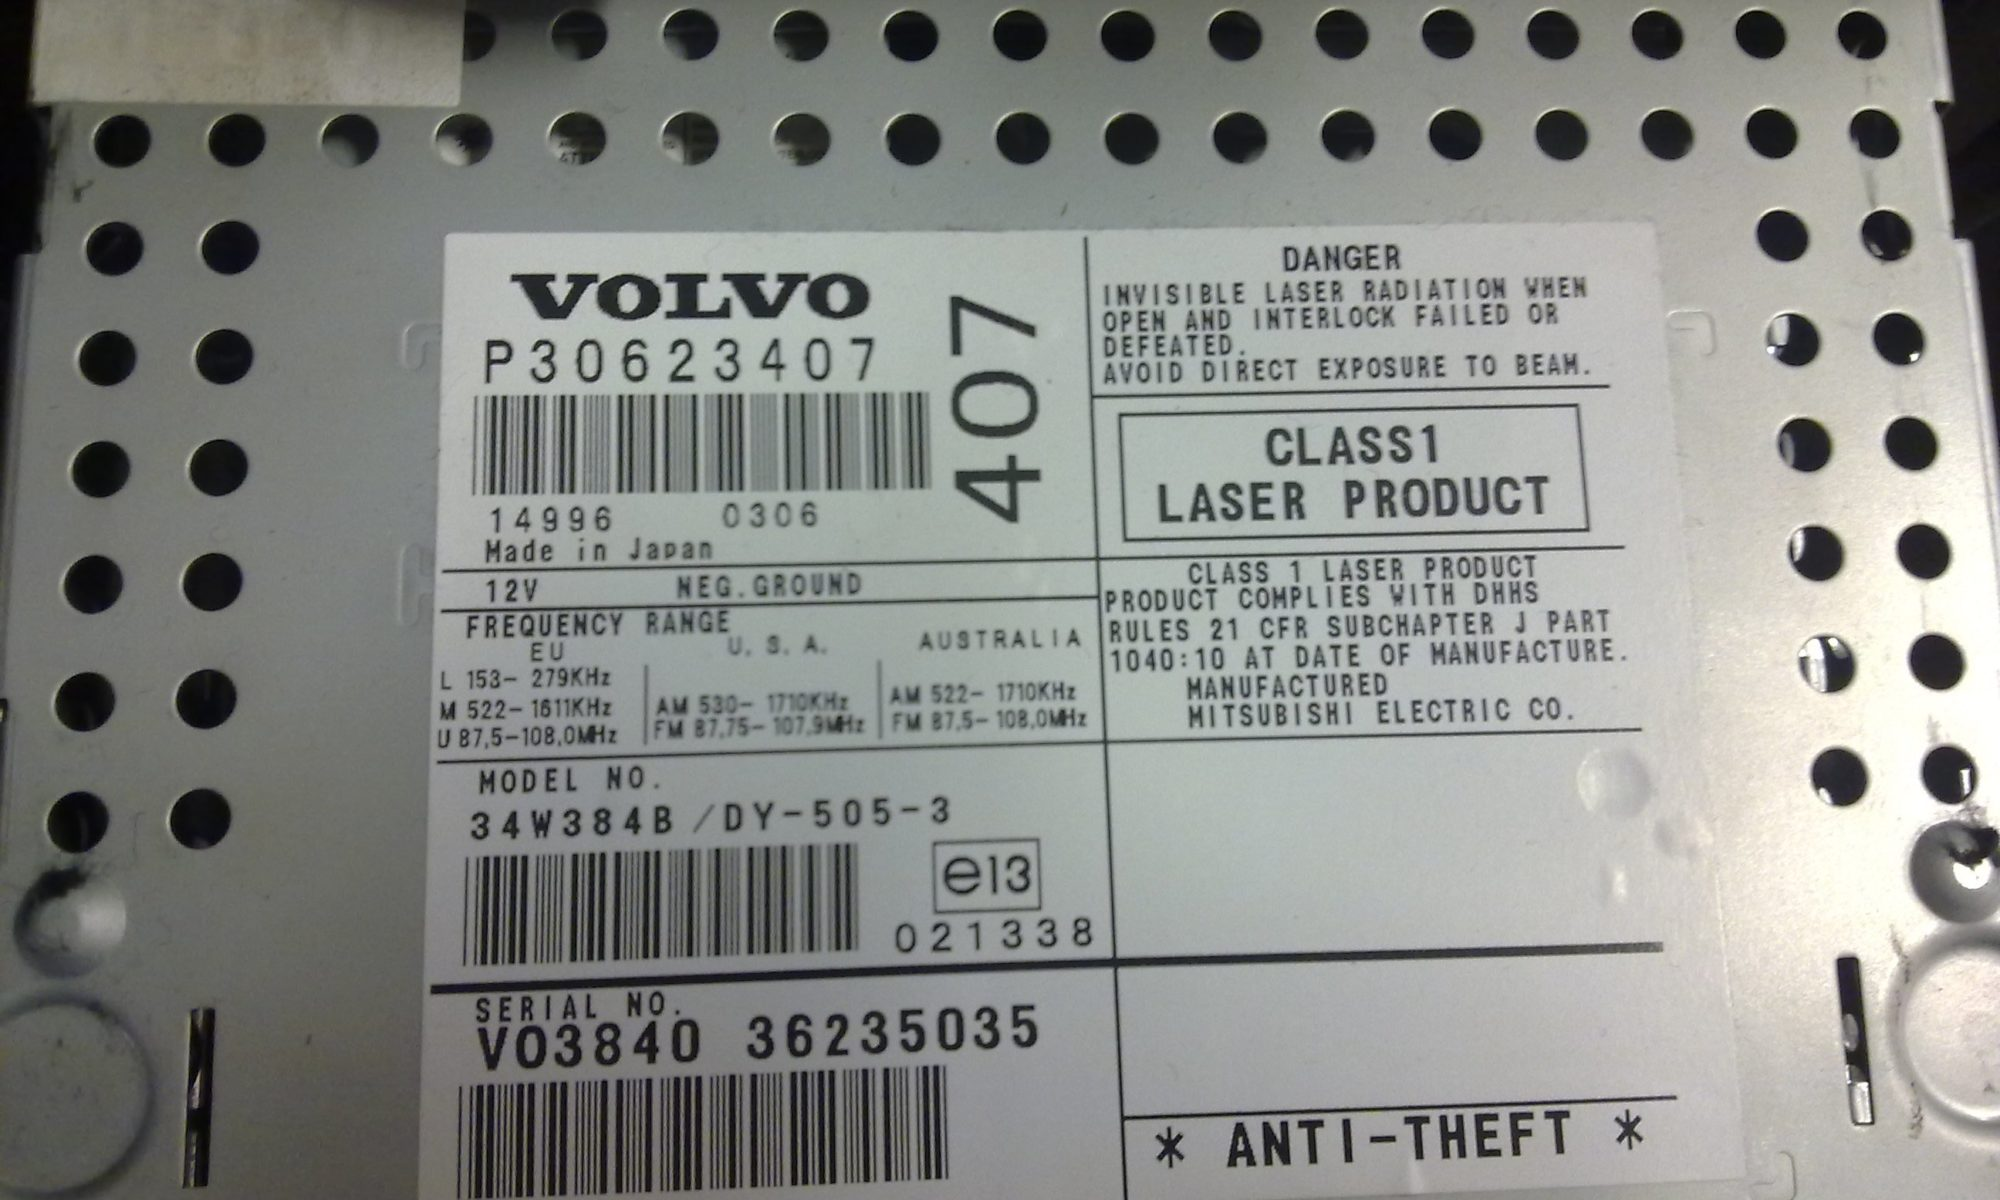 Find Volvo Model Year From VIN - MVS